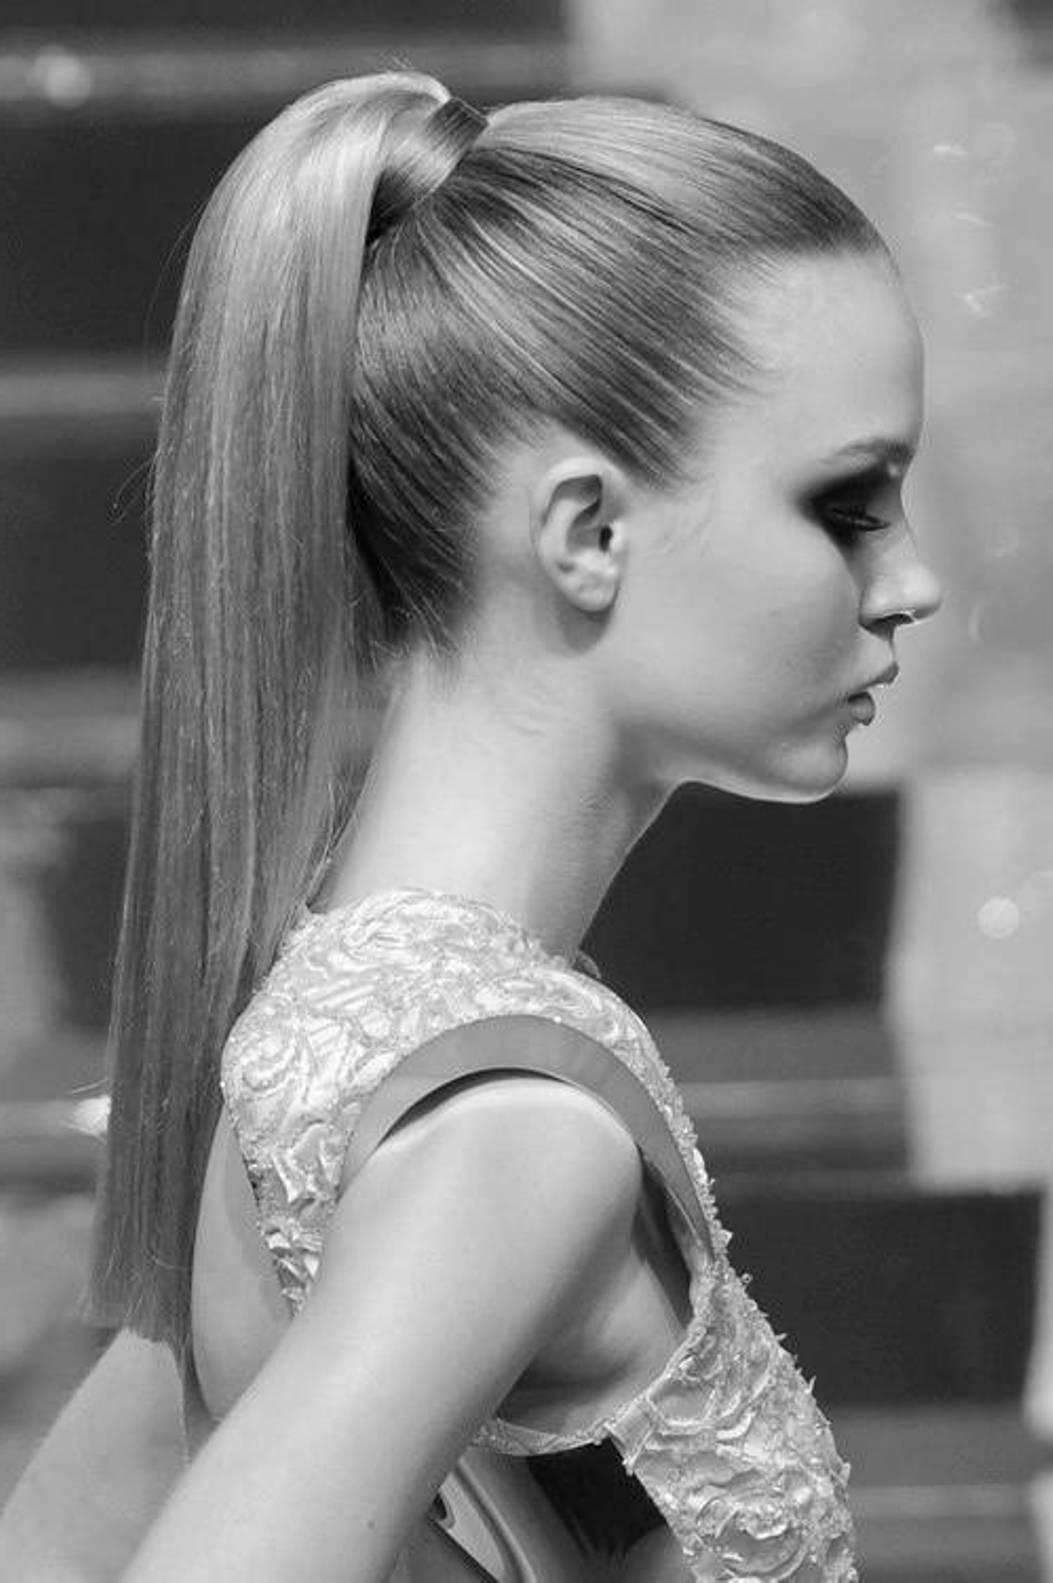 Sleek Cute Ponytail Hairstyle - FMag.com